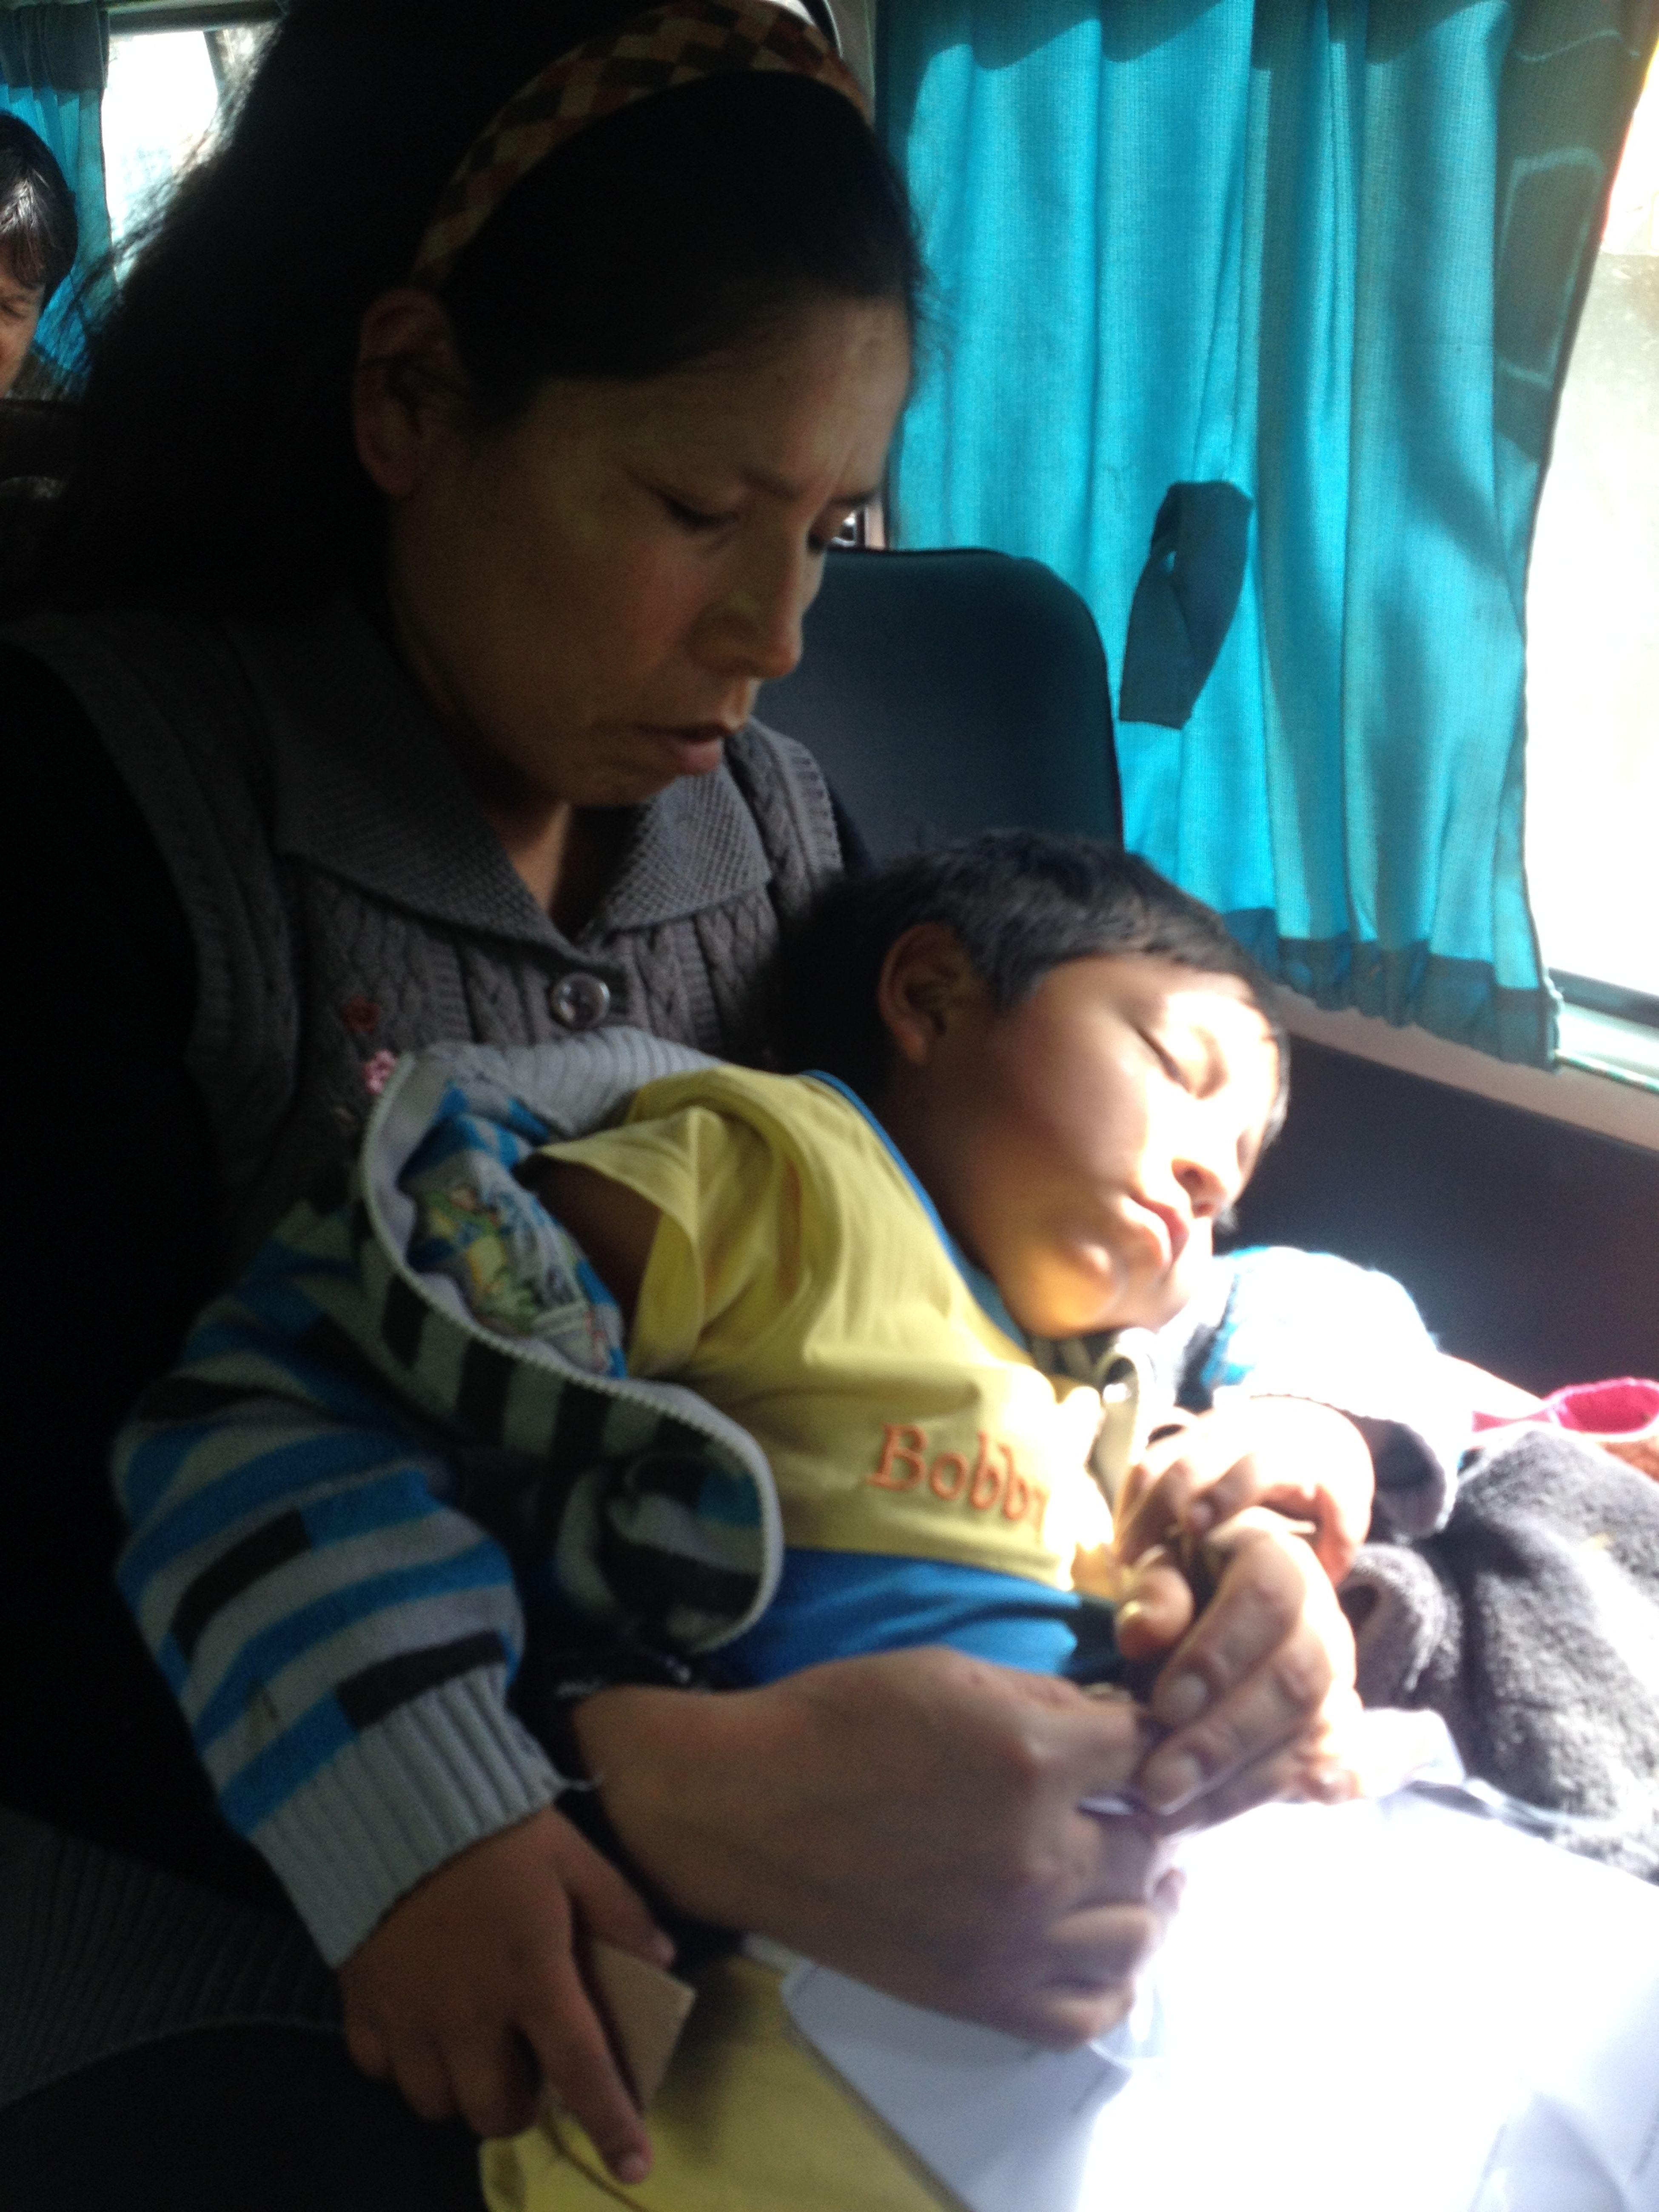 En todo el viaje la mamá nunca soltó a su niño Monochrome Blackandwhite Streetphotography Madre Family Huaraz, Peru Vida Urbana Urban Urban Life The Places I've Been Today